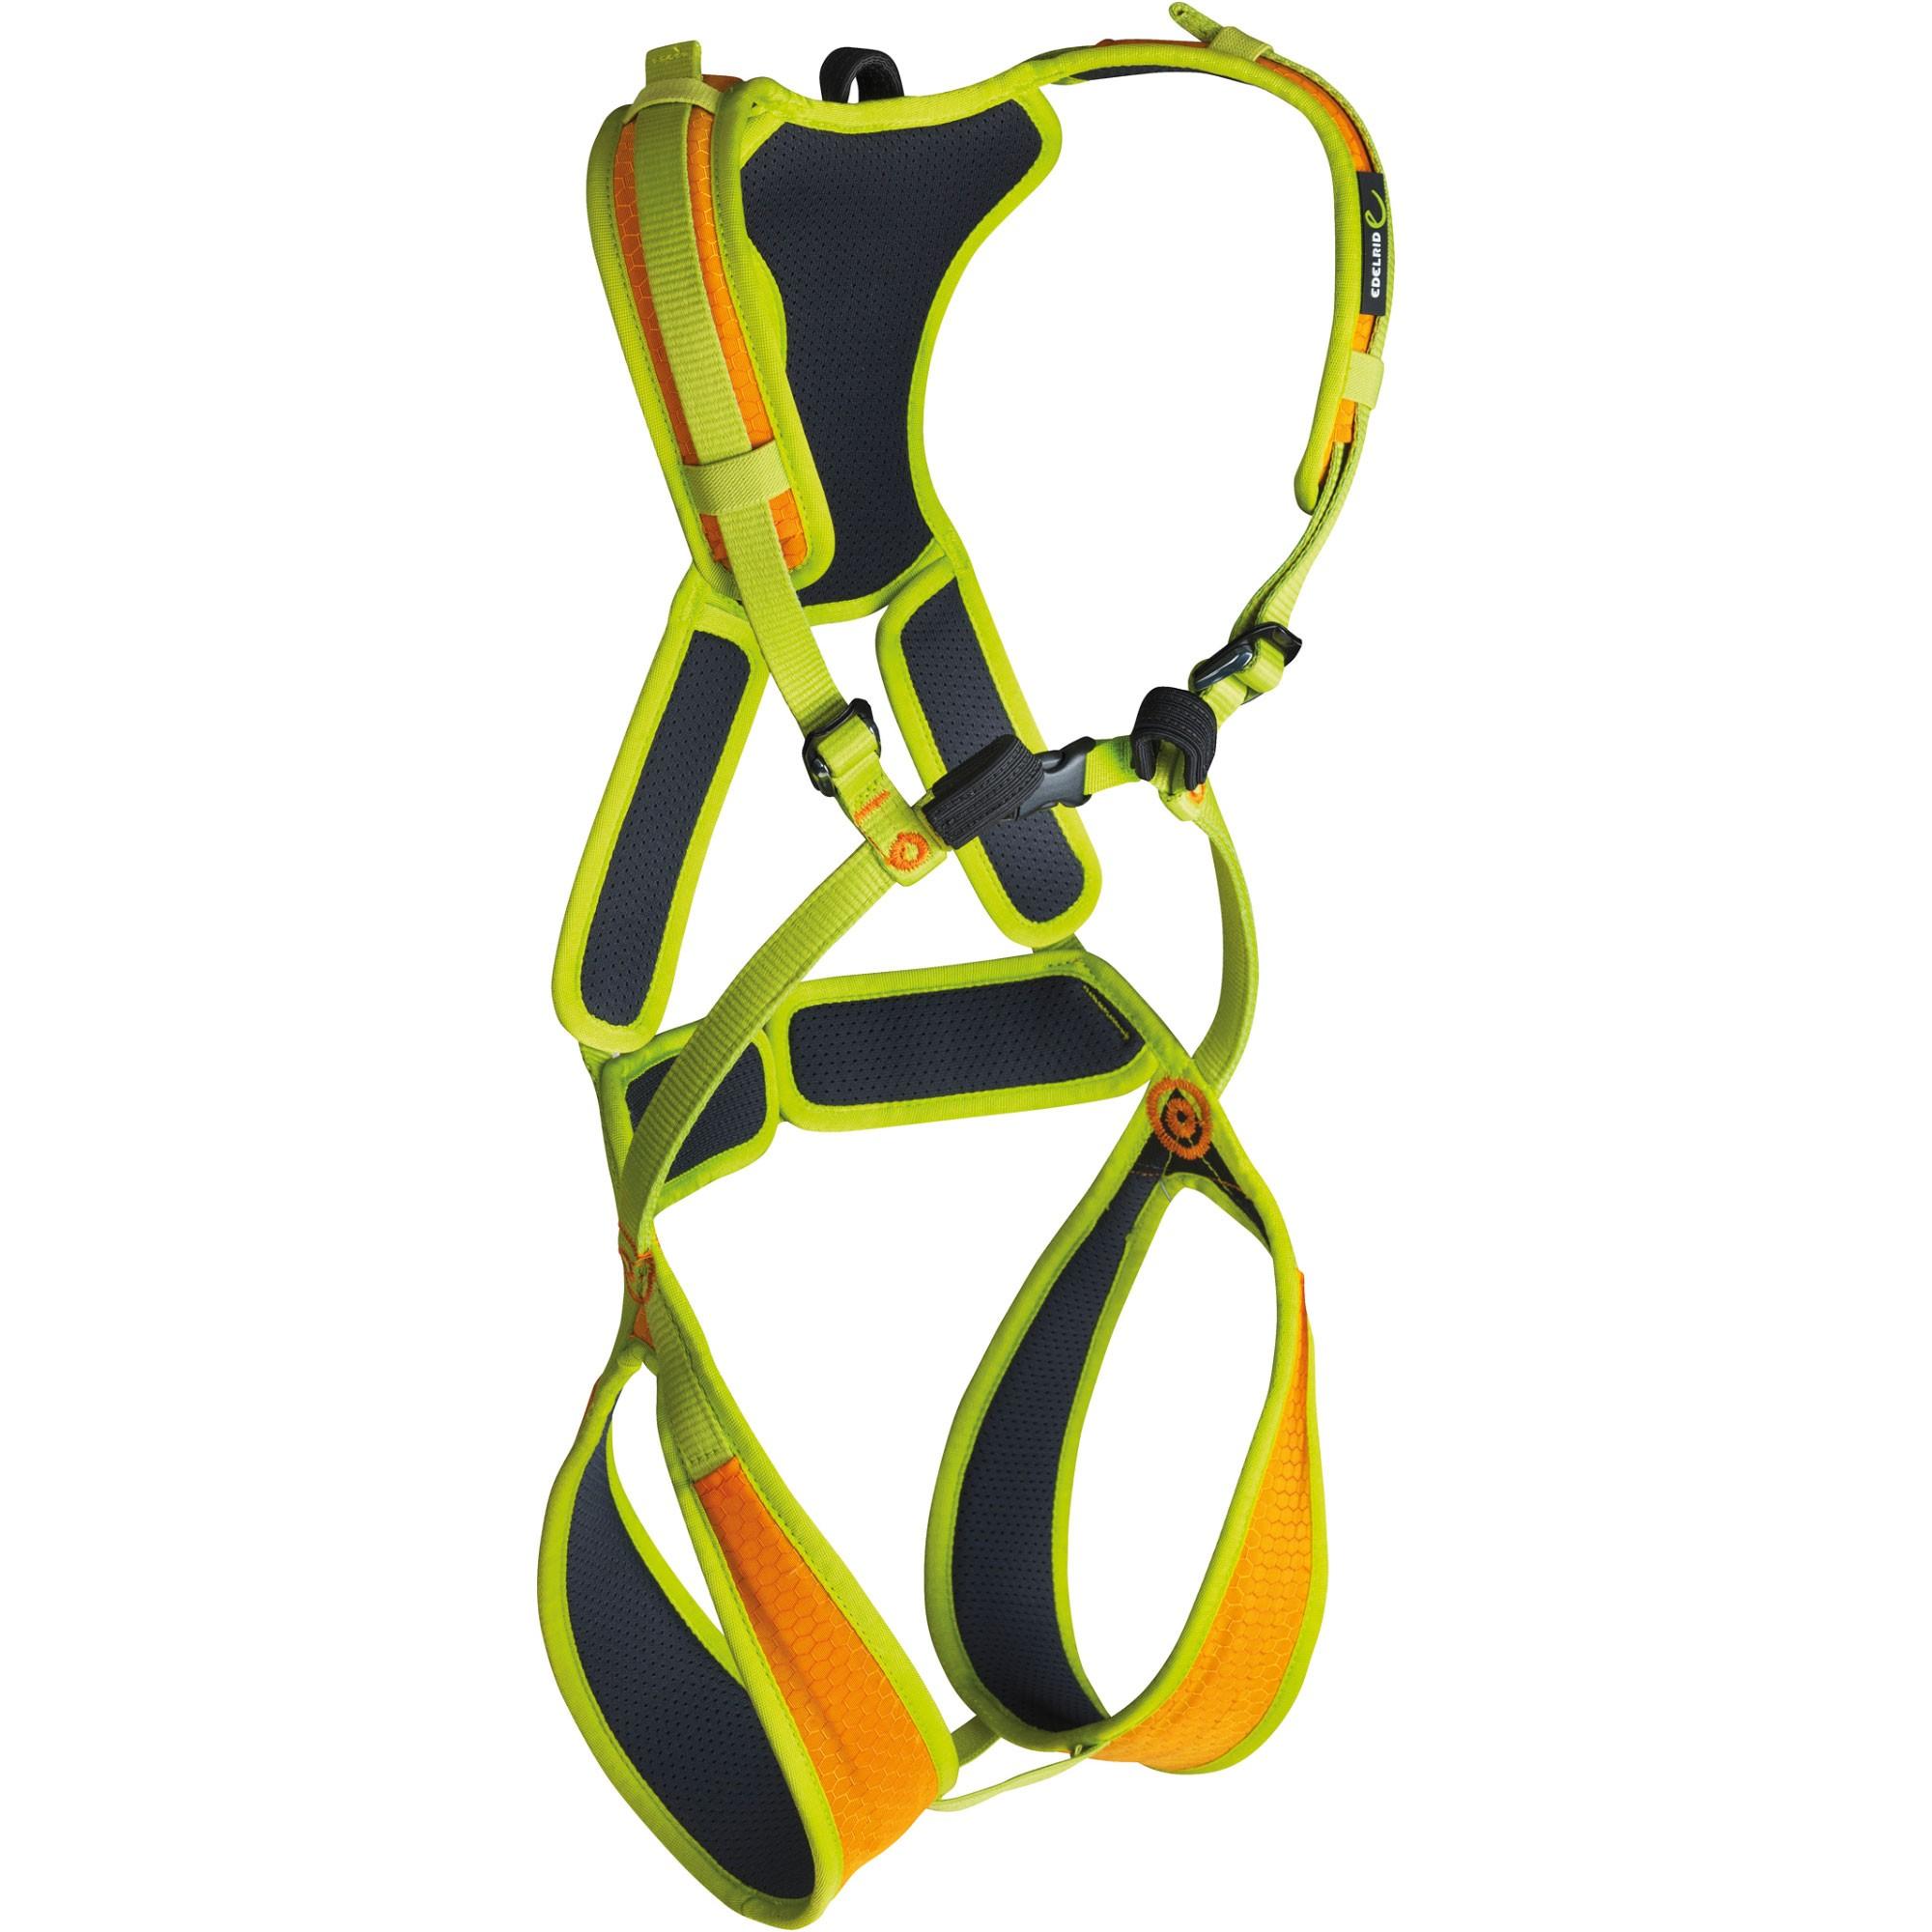 Edelrid Fraggle II Children's Climbing Harness - Sahara/Oasis